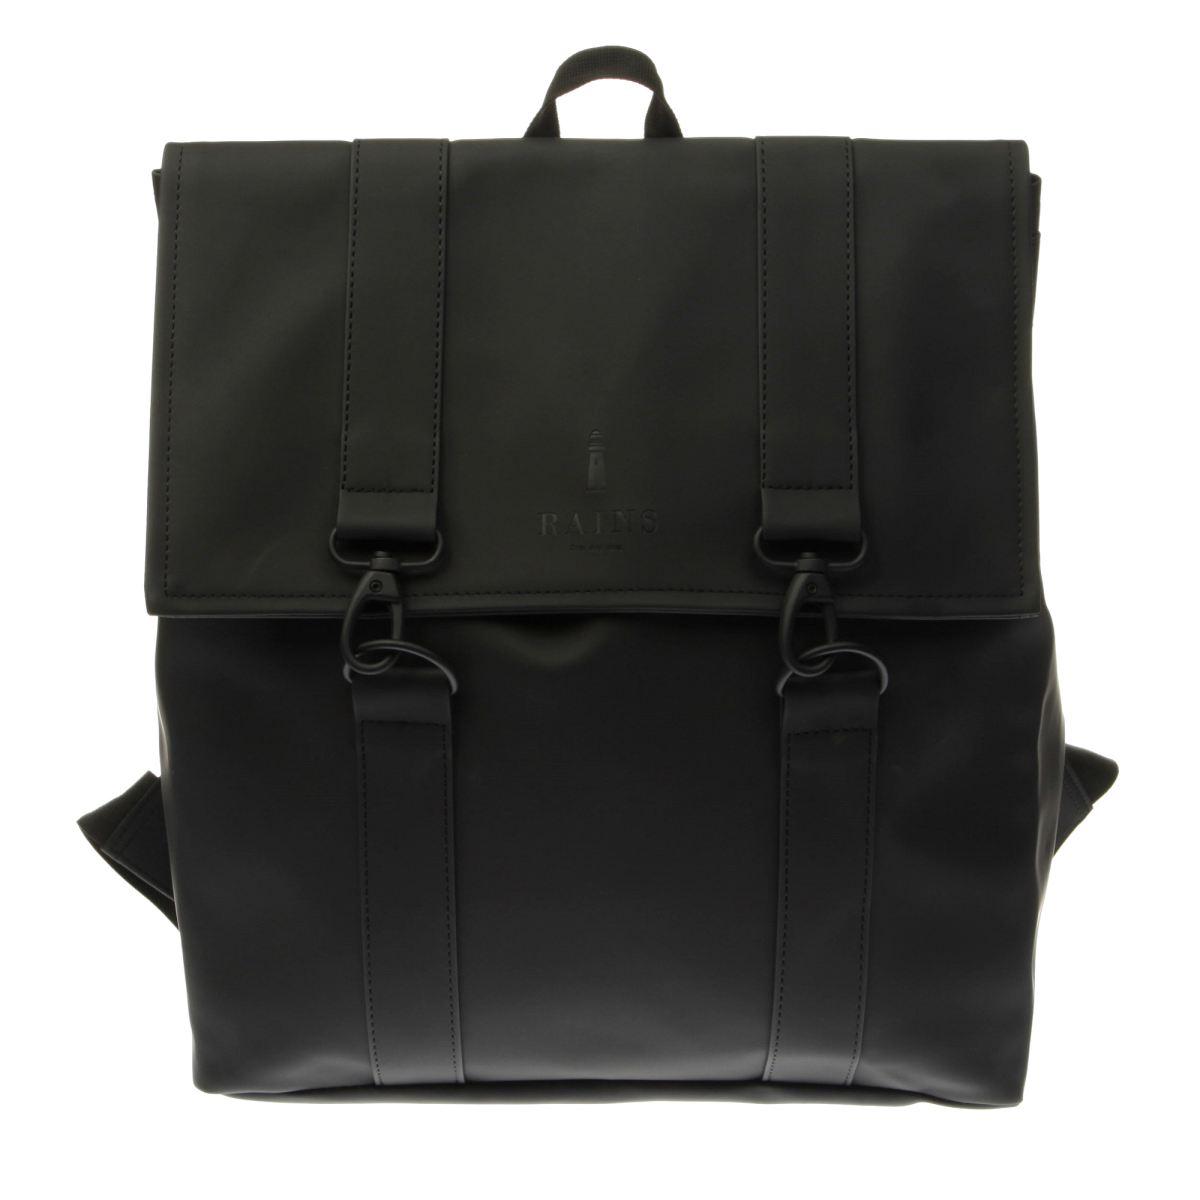 Rains Rains Black Messenger Bags